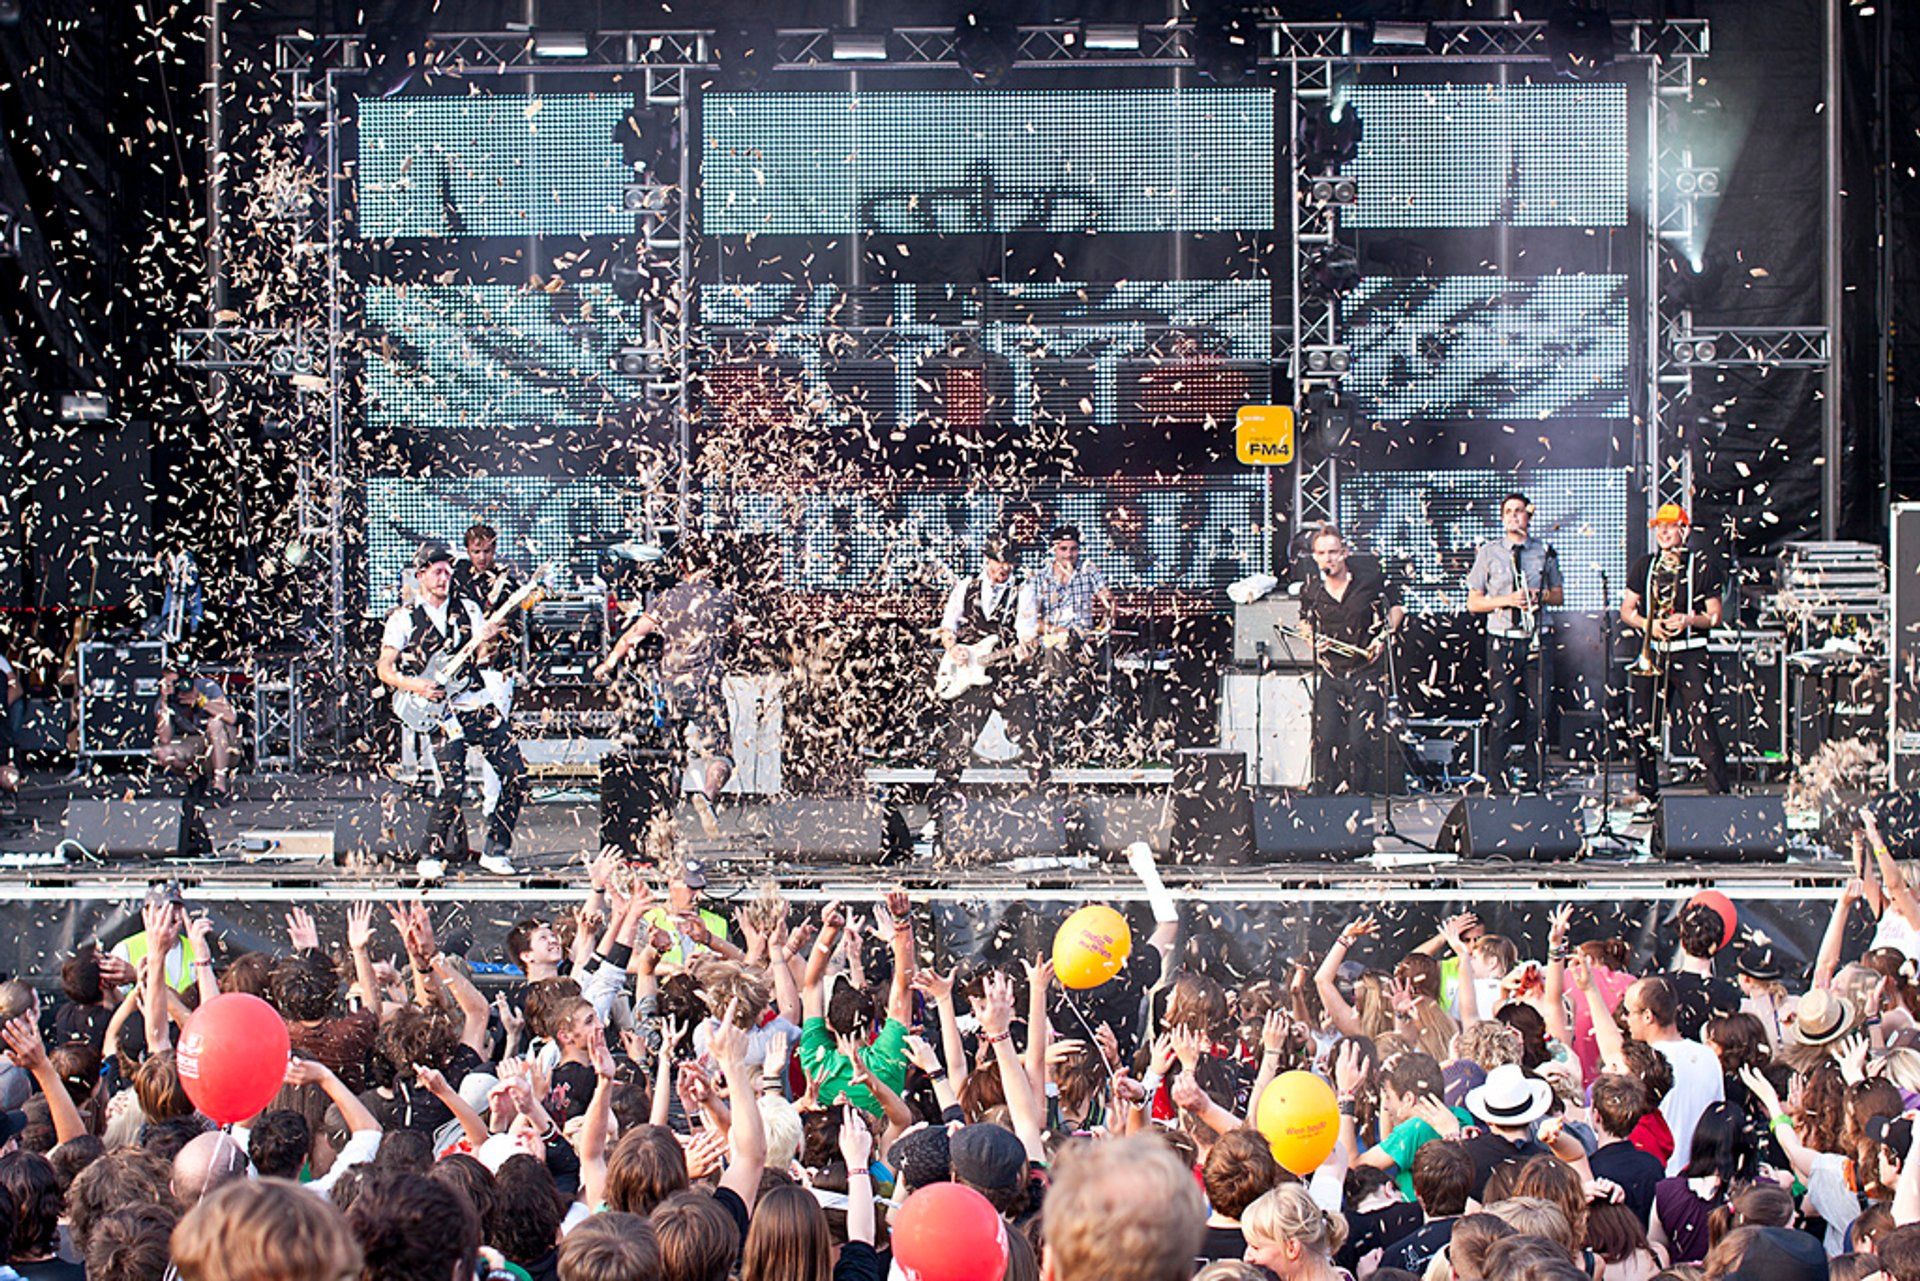 Donauinselfest (Danube Island Festival) in Vienna 2020 - Best Time